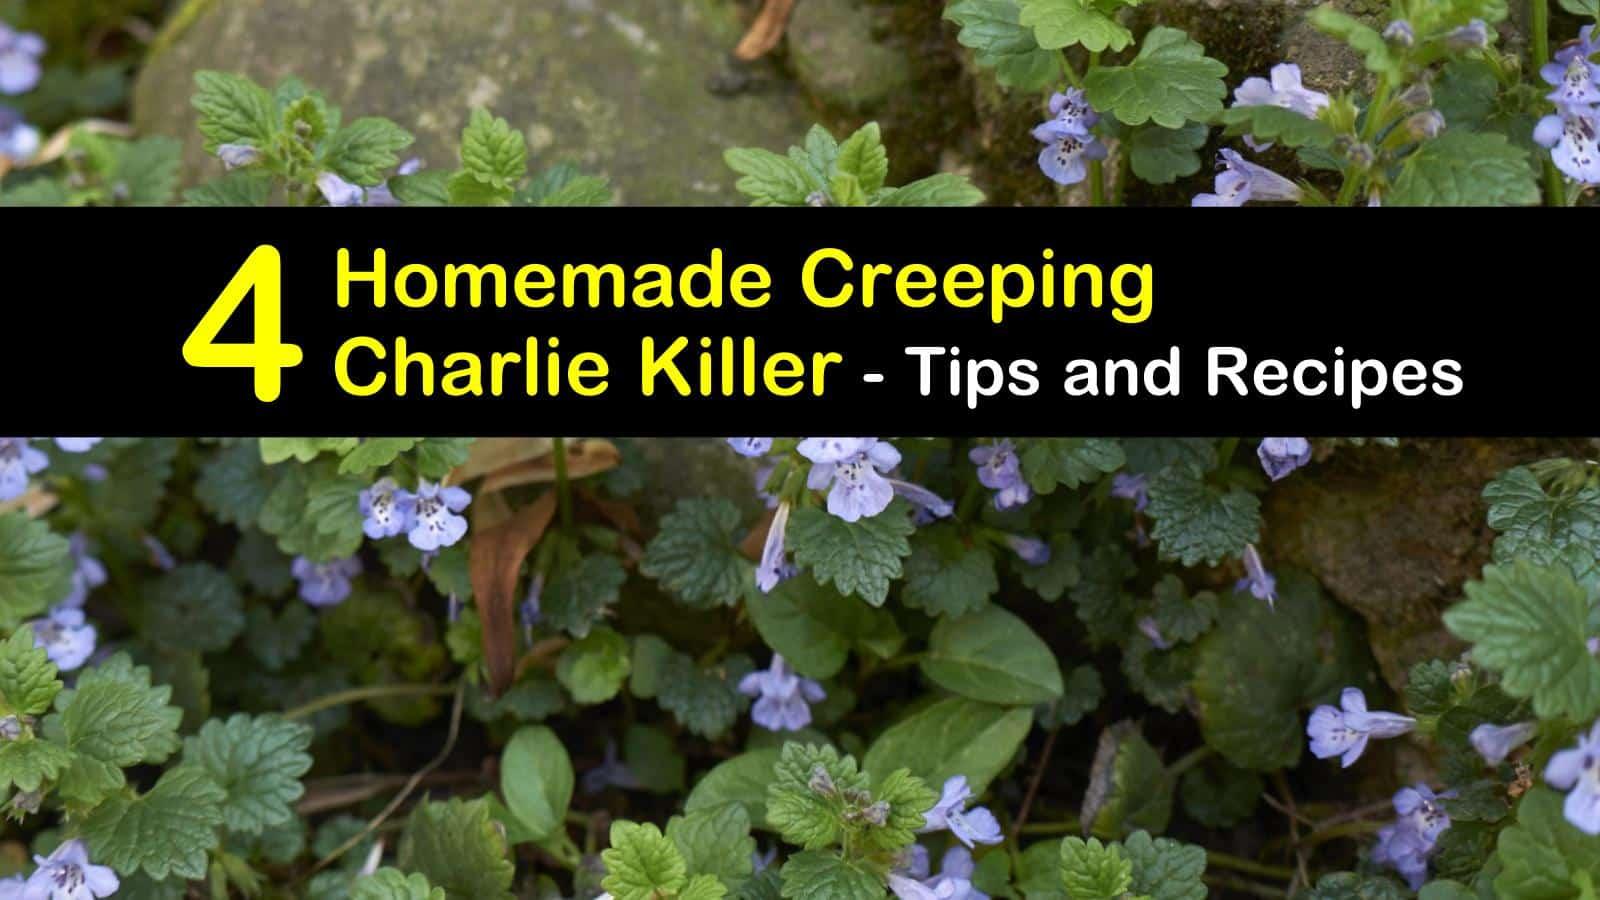 homemade creeping charlie killer titleimg1